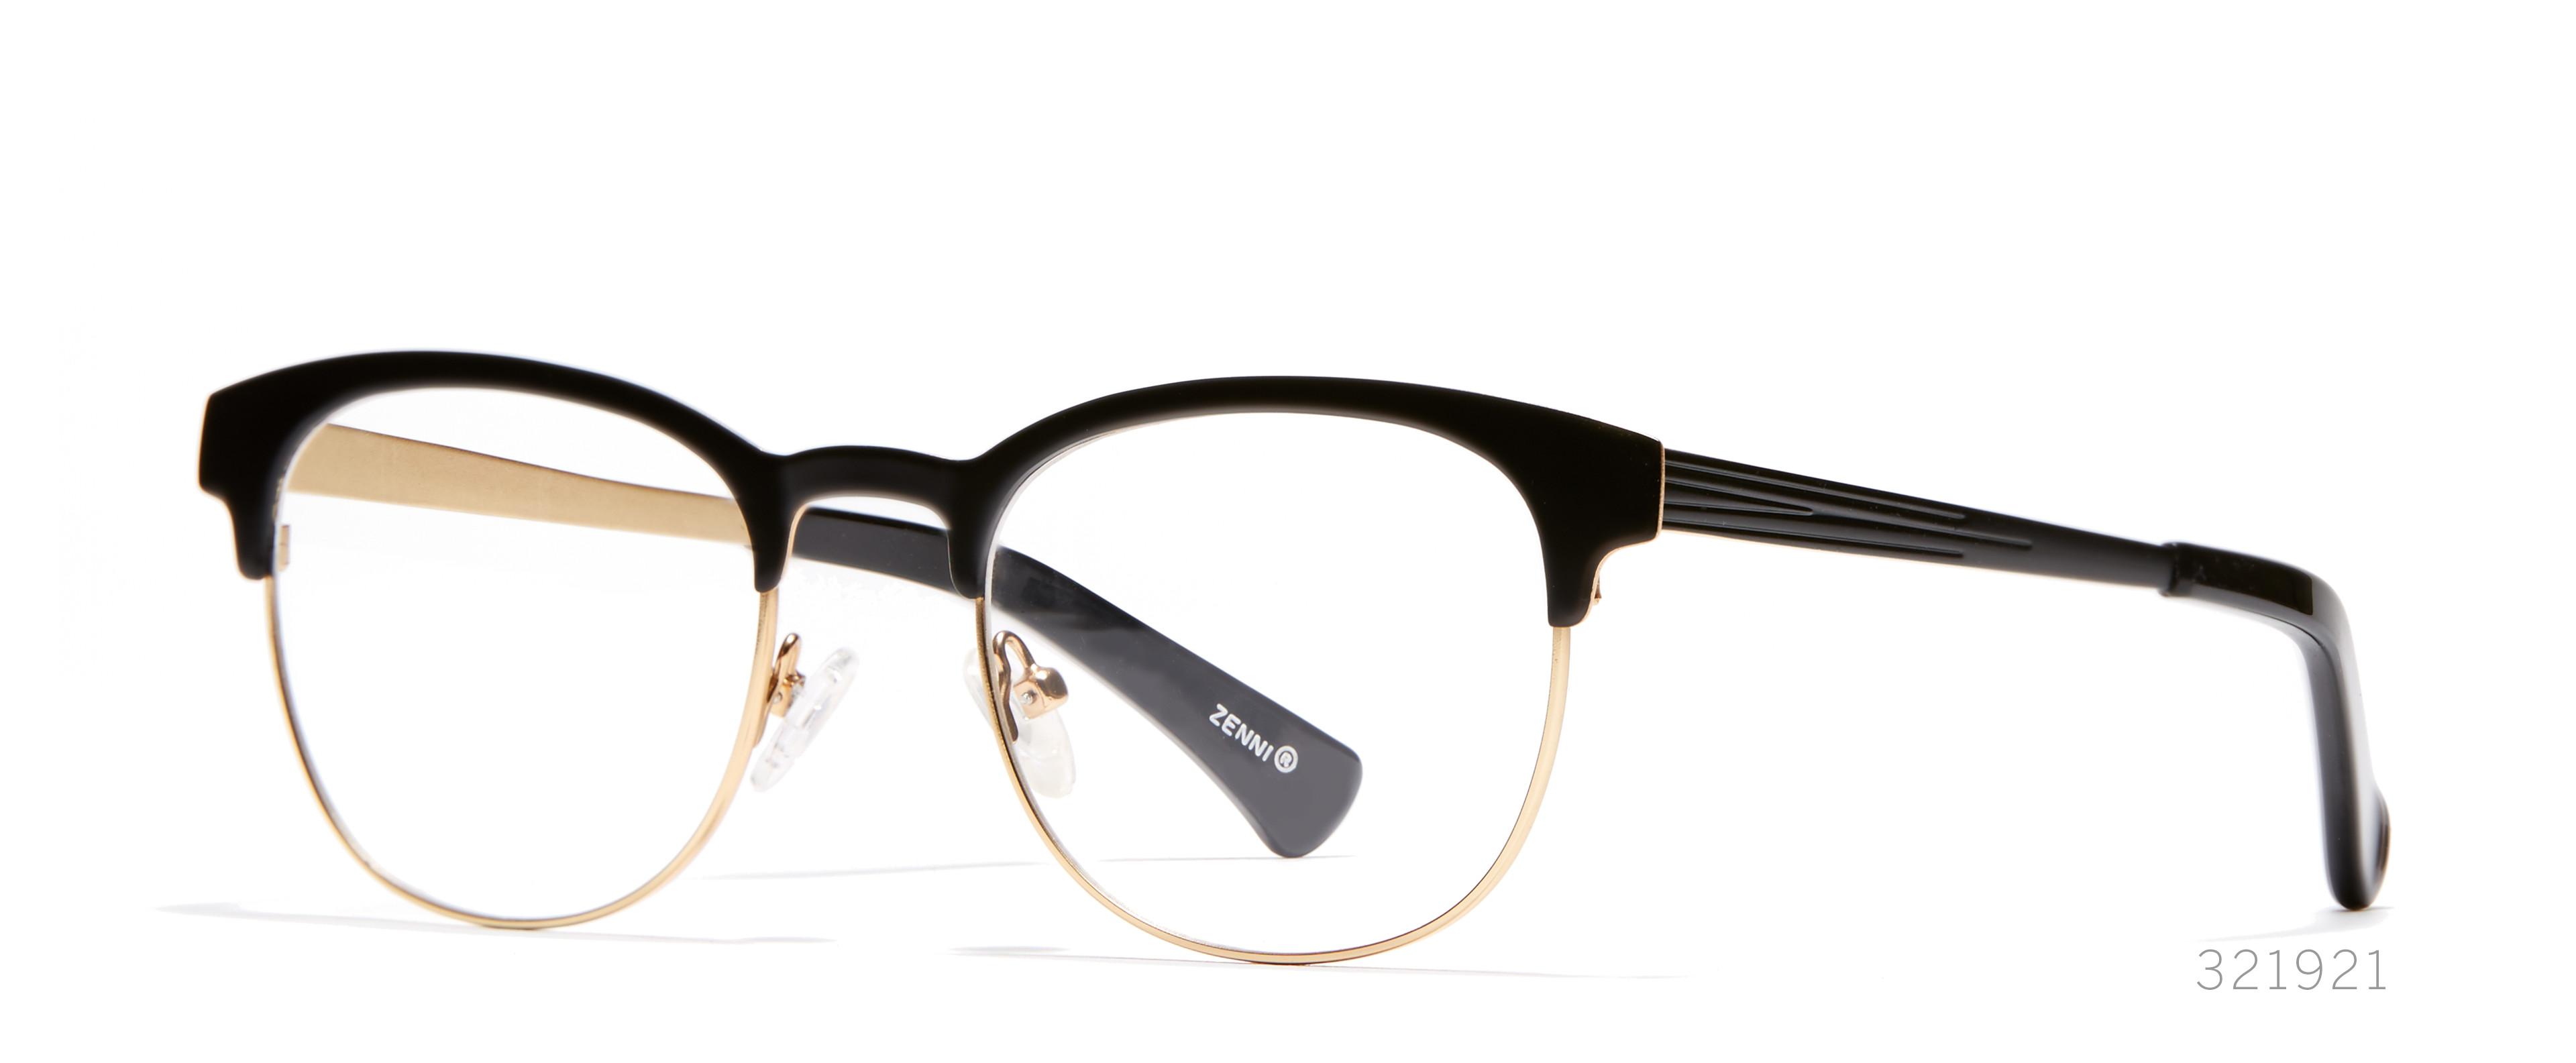 browline-diamond face shaped glasses